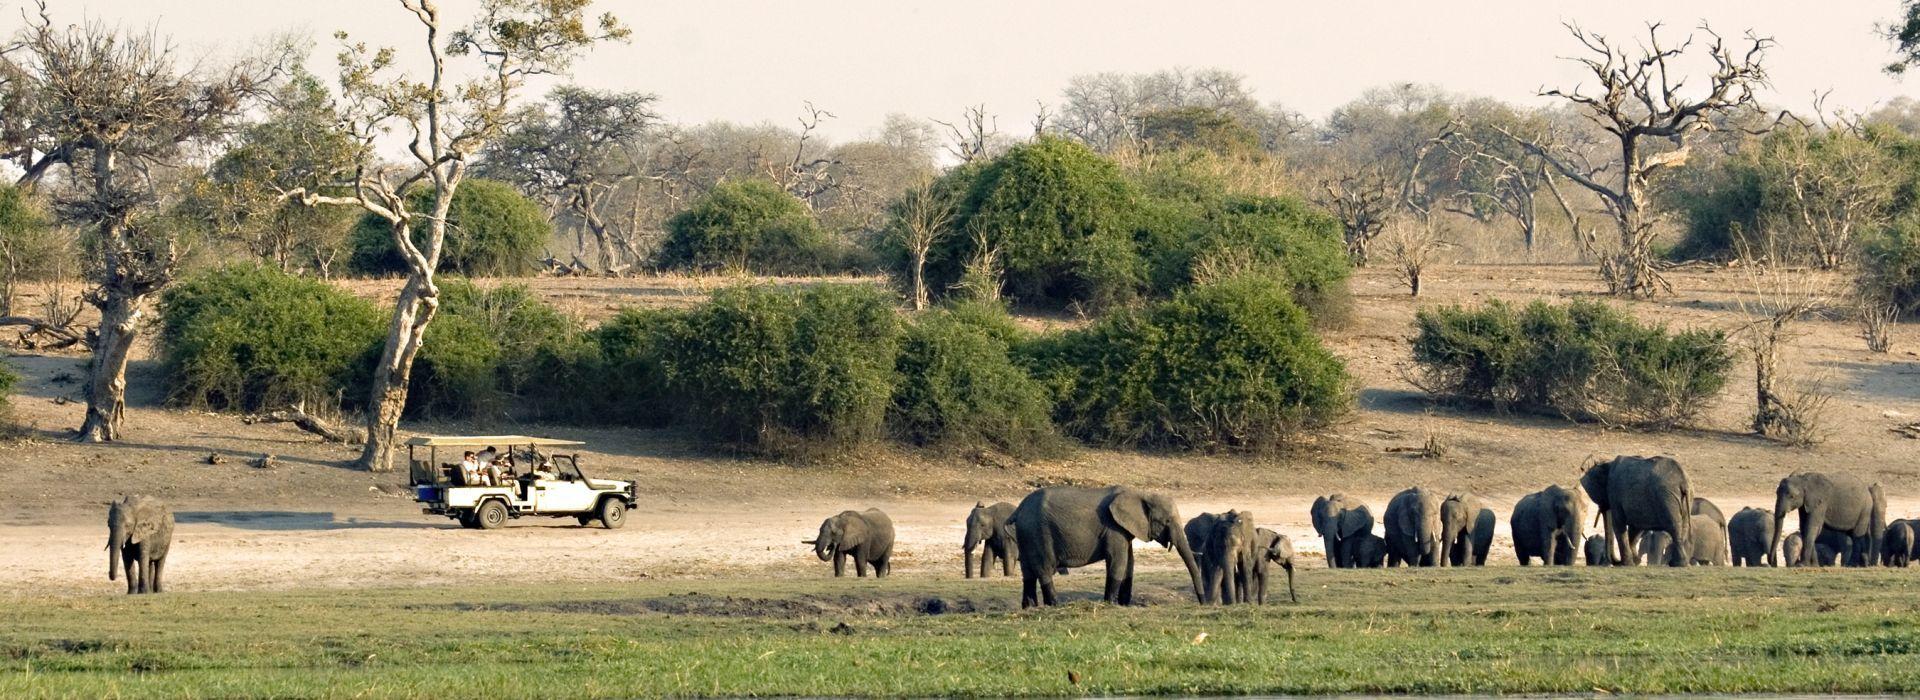 Wildlife safaris and game drives Tours in Botswana